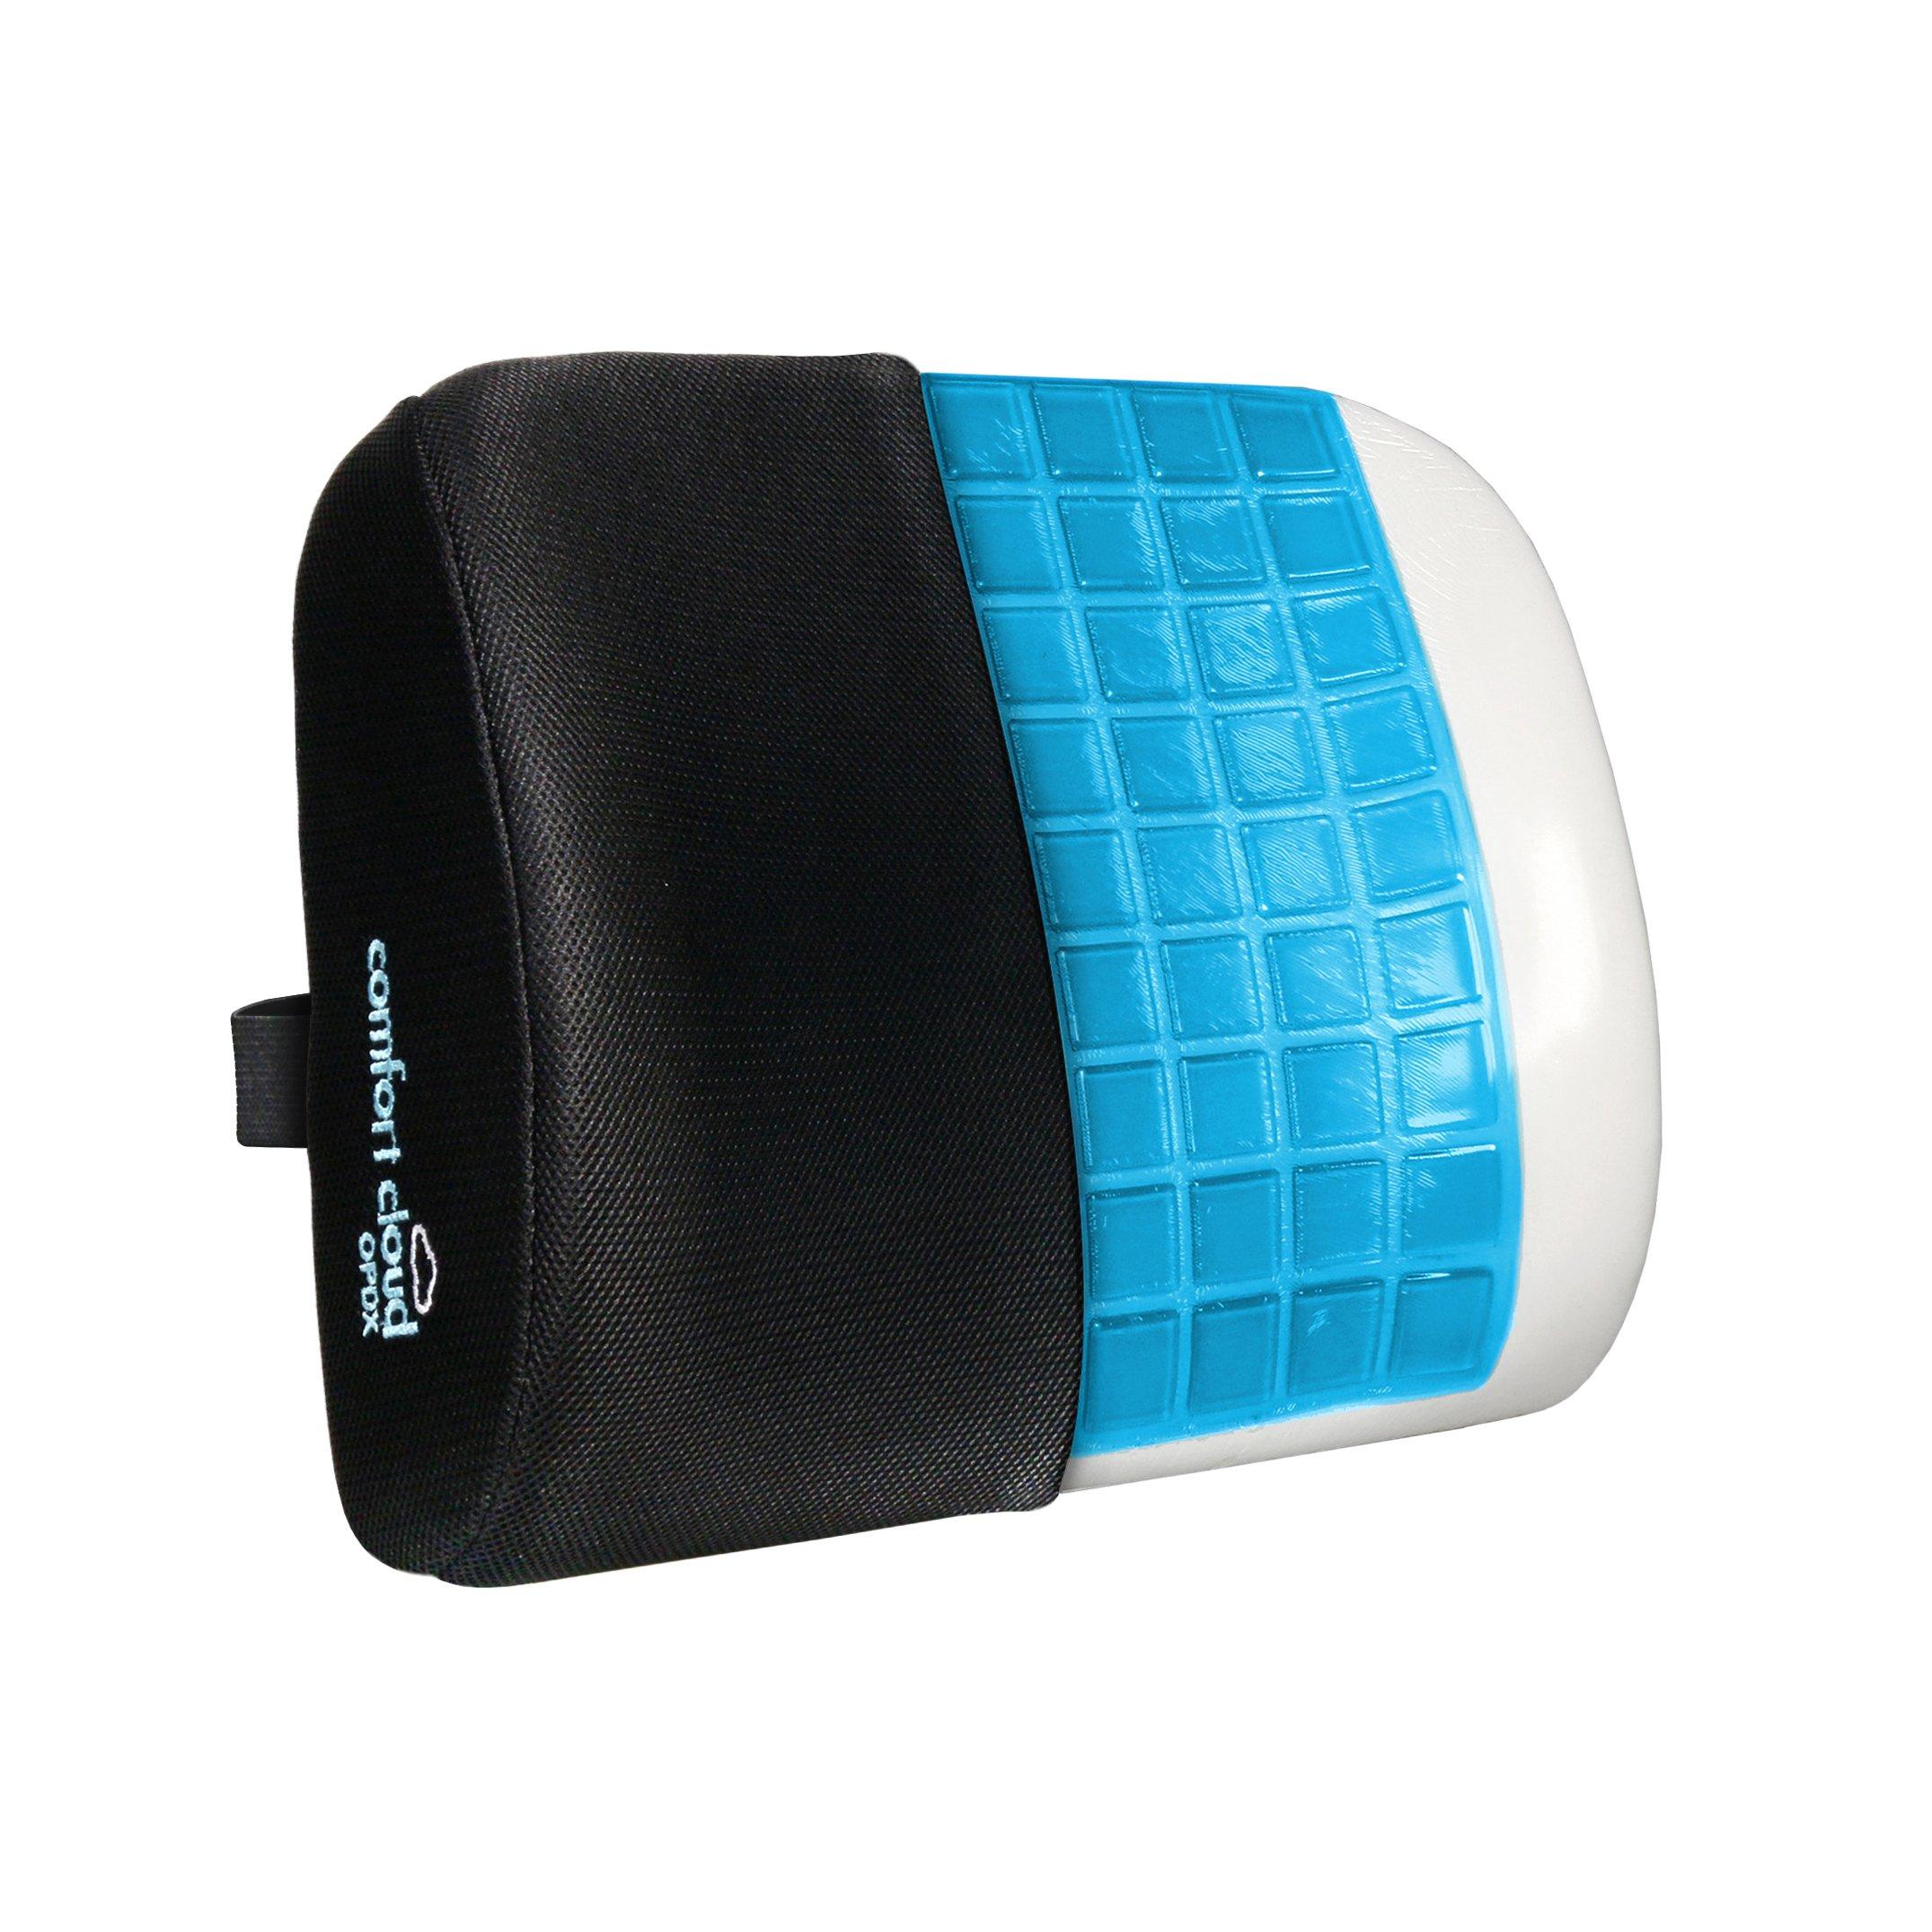 Comfort Cloud Lumbar Support Pillow- Premium Hybrid Cooling Gel and Memory Foam Lumbar Cushion, Breathable Mesh, Non-Slip Orthopedic Lumbar Pillow. Lower Back Pain Cushion, Office, Travel, Wheelchair